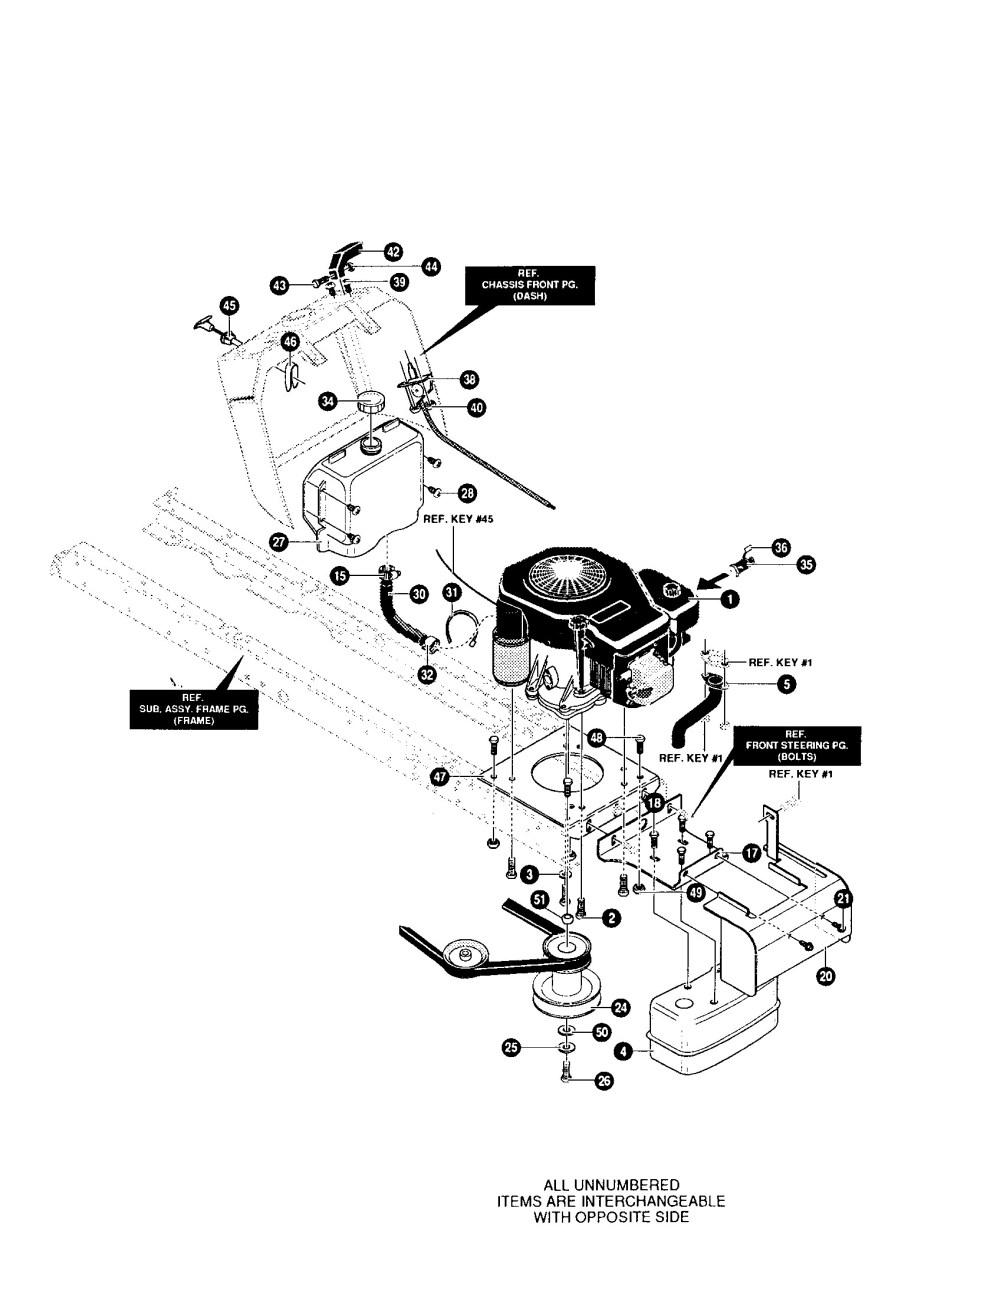 medium resolution of kohler engine wiring diagram 20 hp magnum 27 hp kohler engine 20 hp kohler engine diagram